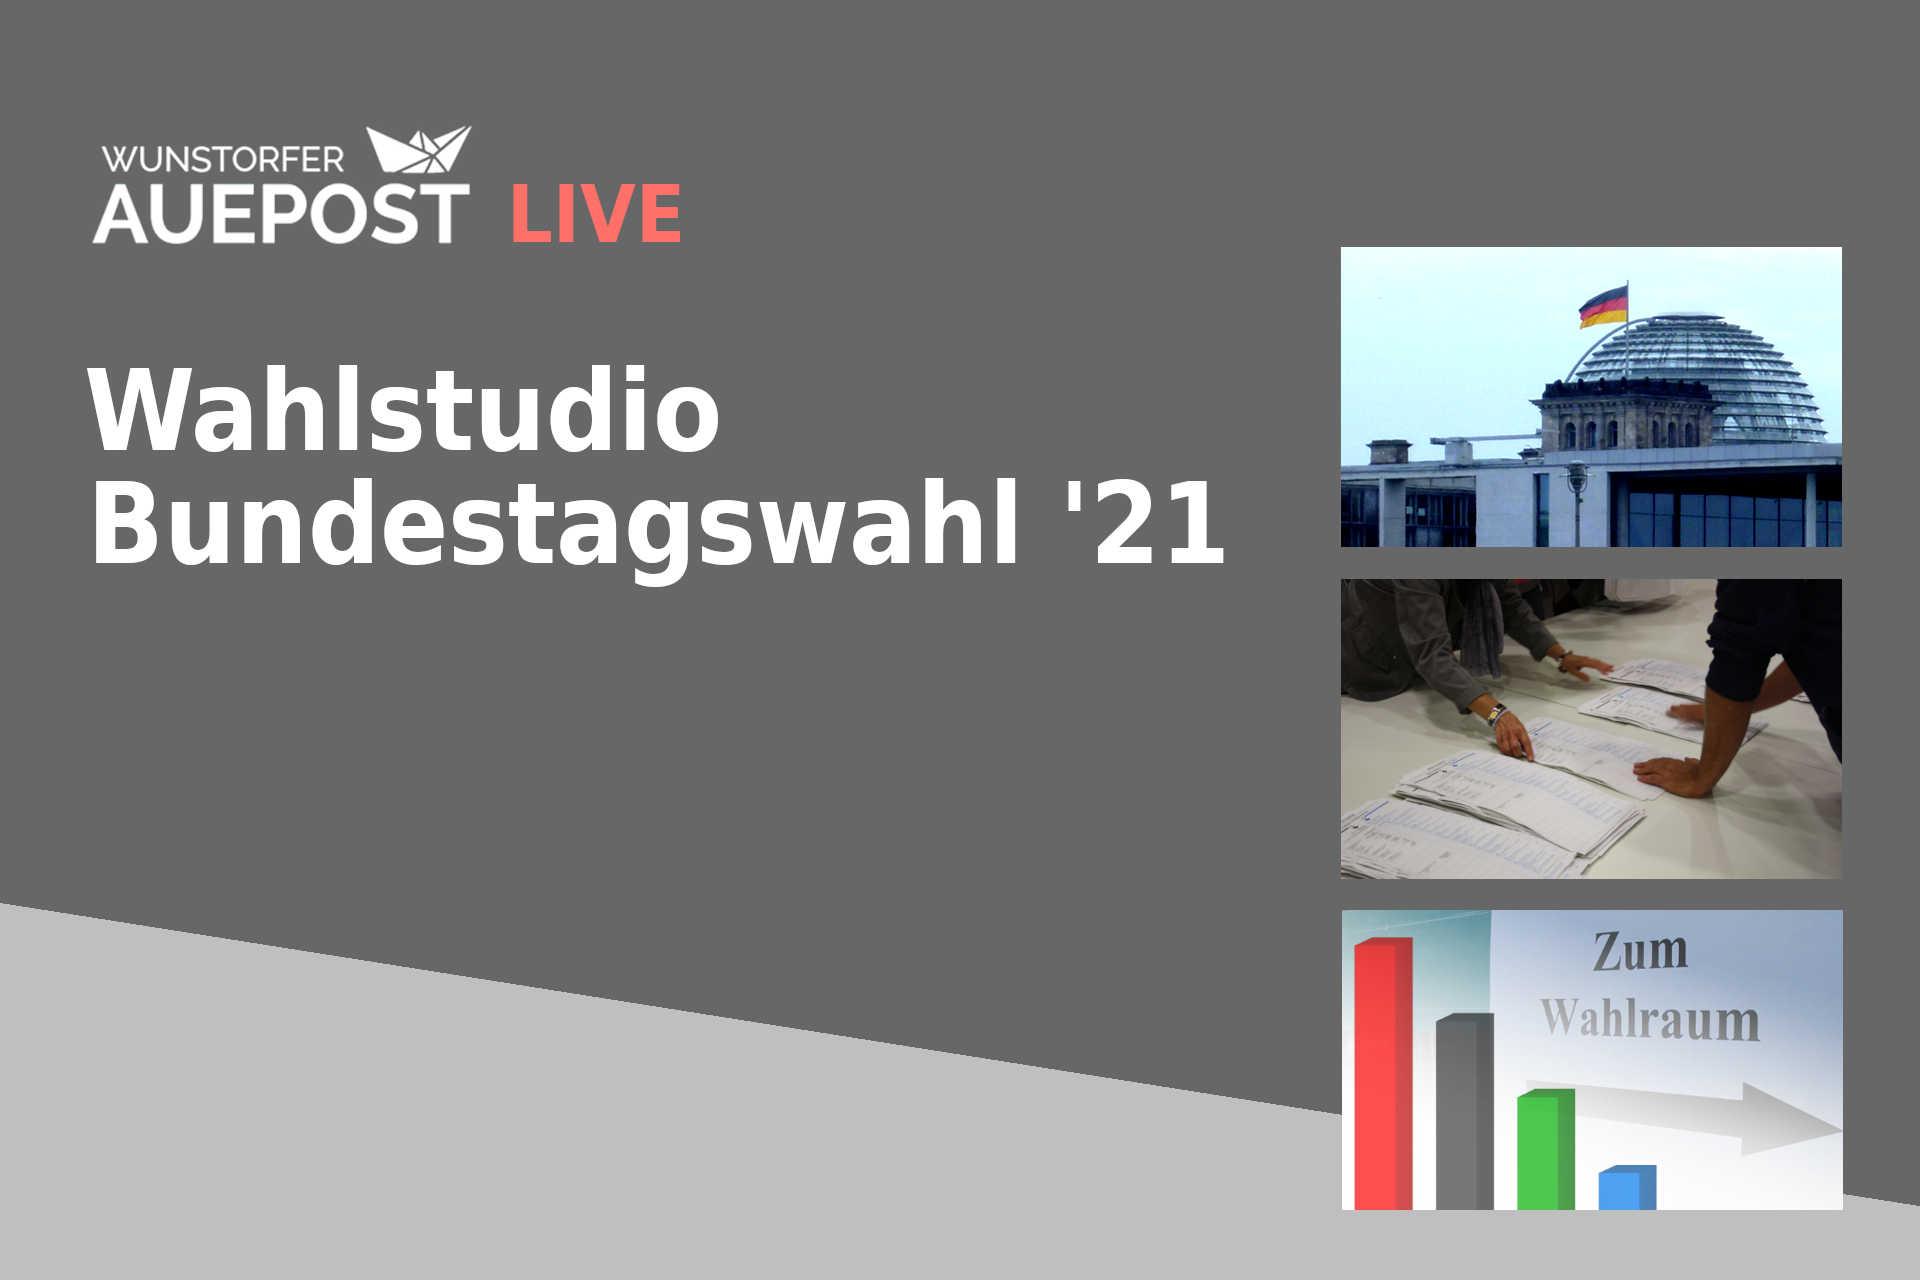 Wahlstudio Bundestagswahl Wunstorf 2021